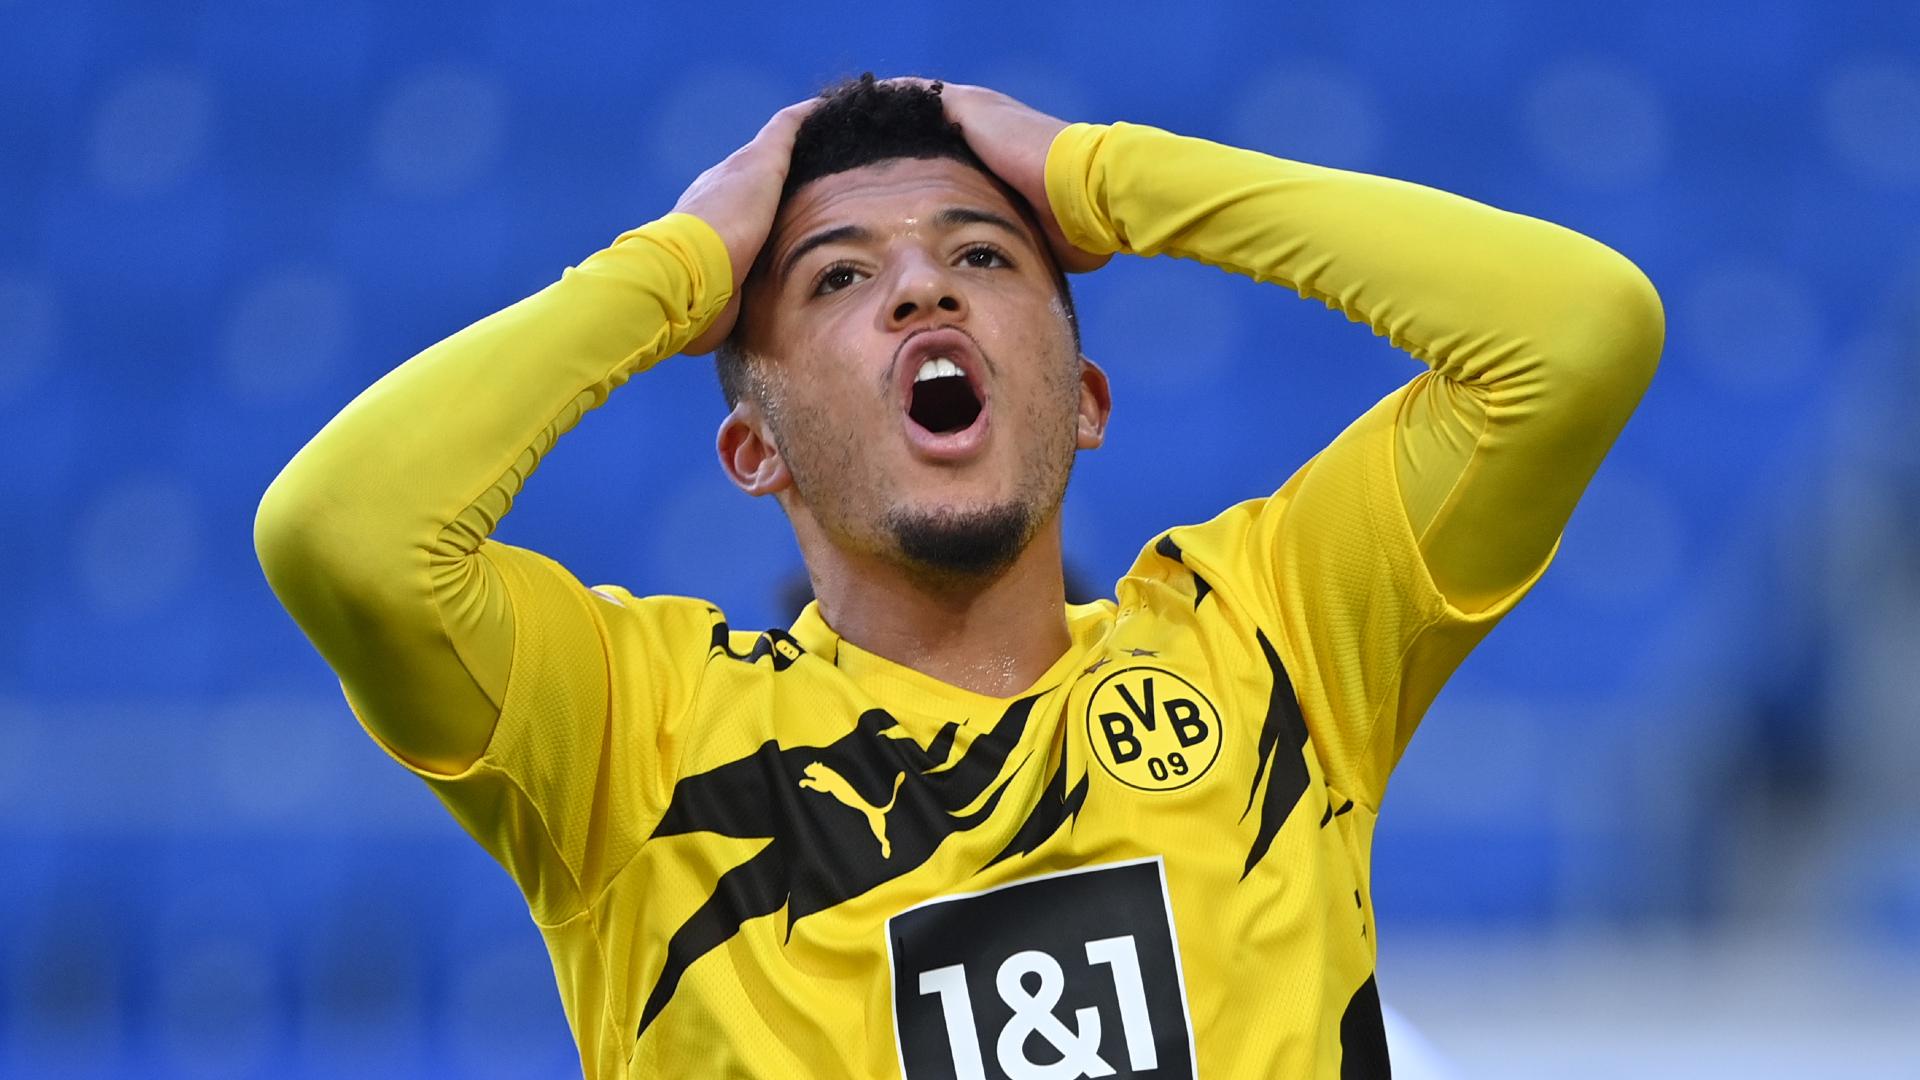 'Sancho had already prepared for a change' - Dortmund star lost focus amid Manchester United links, admits Watzke